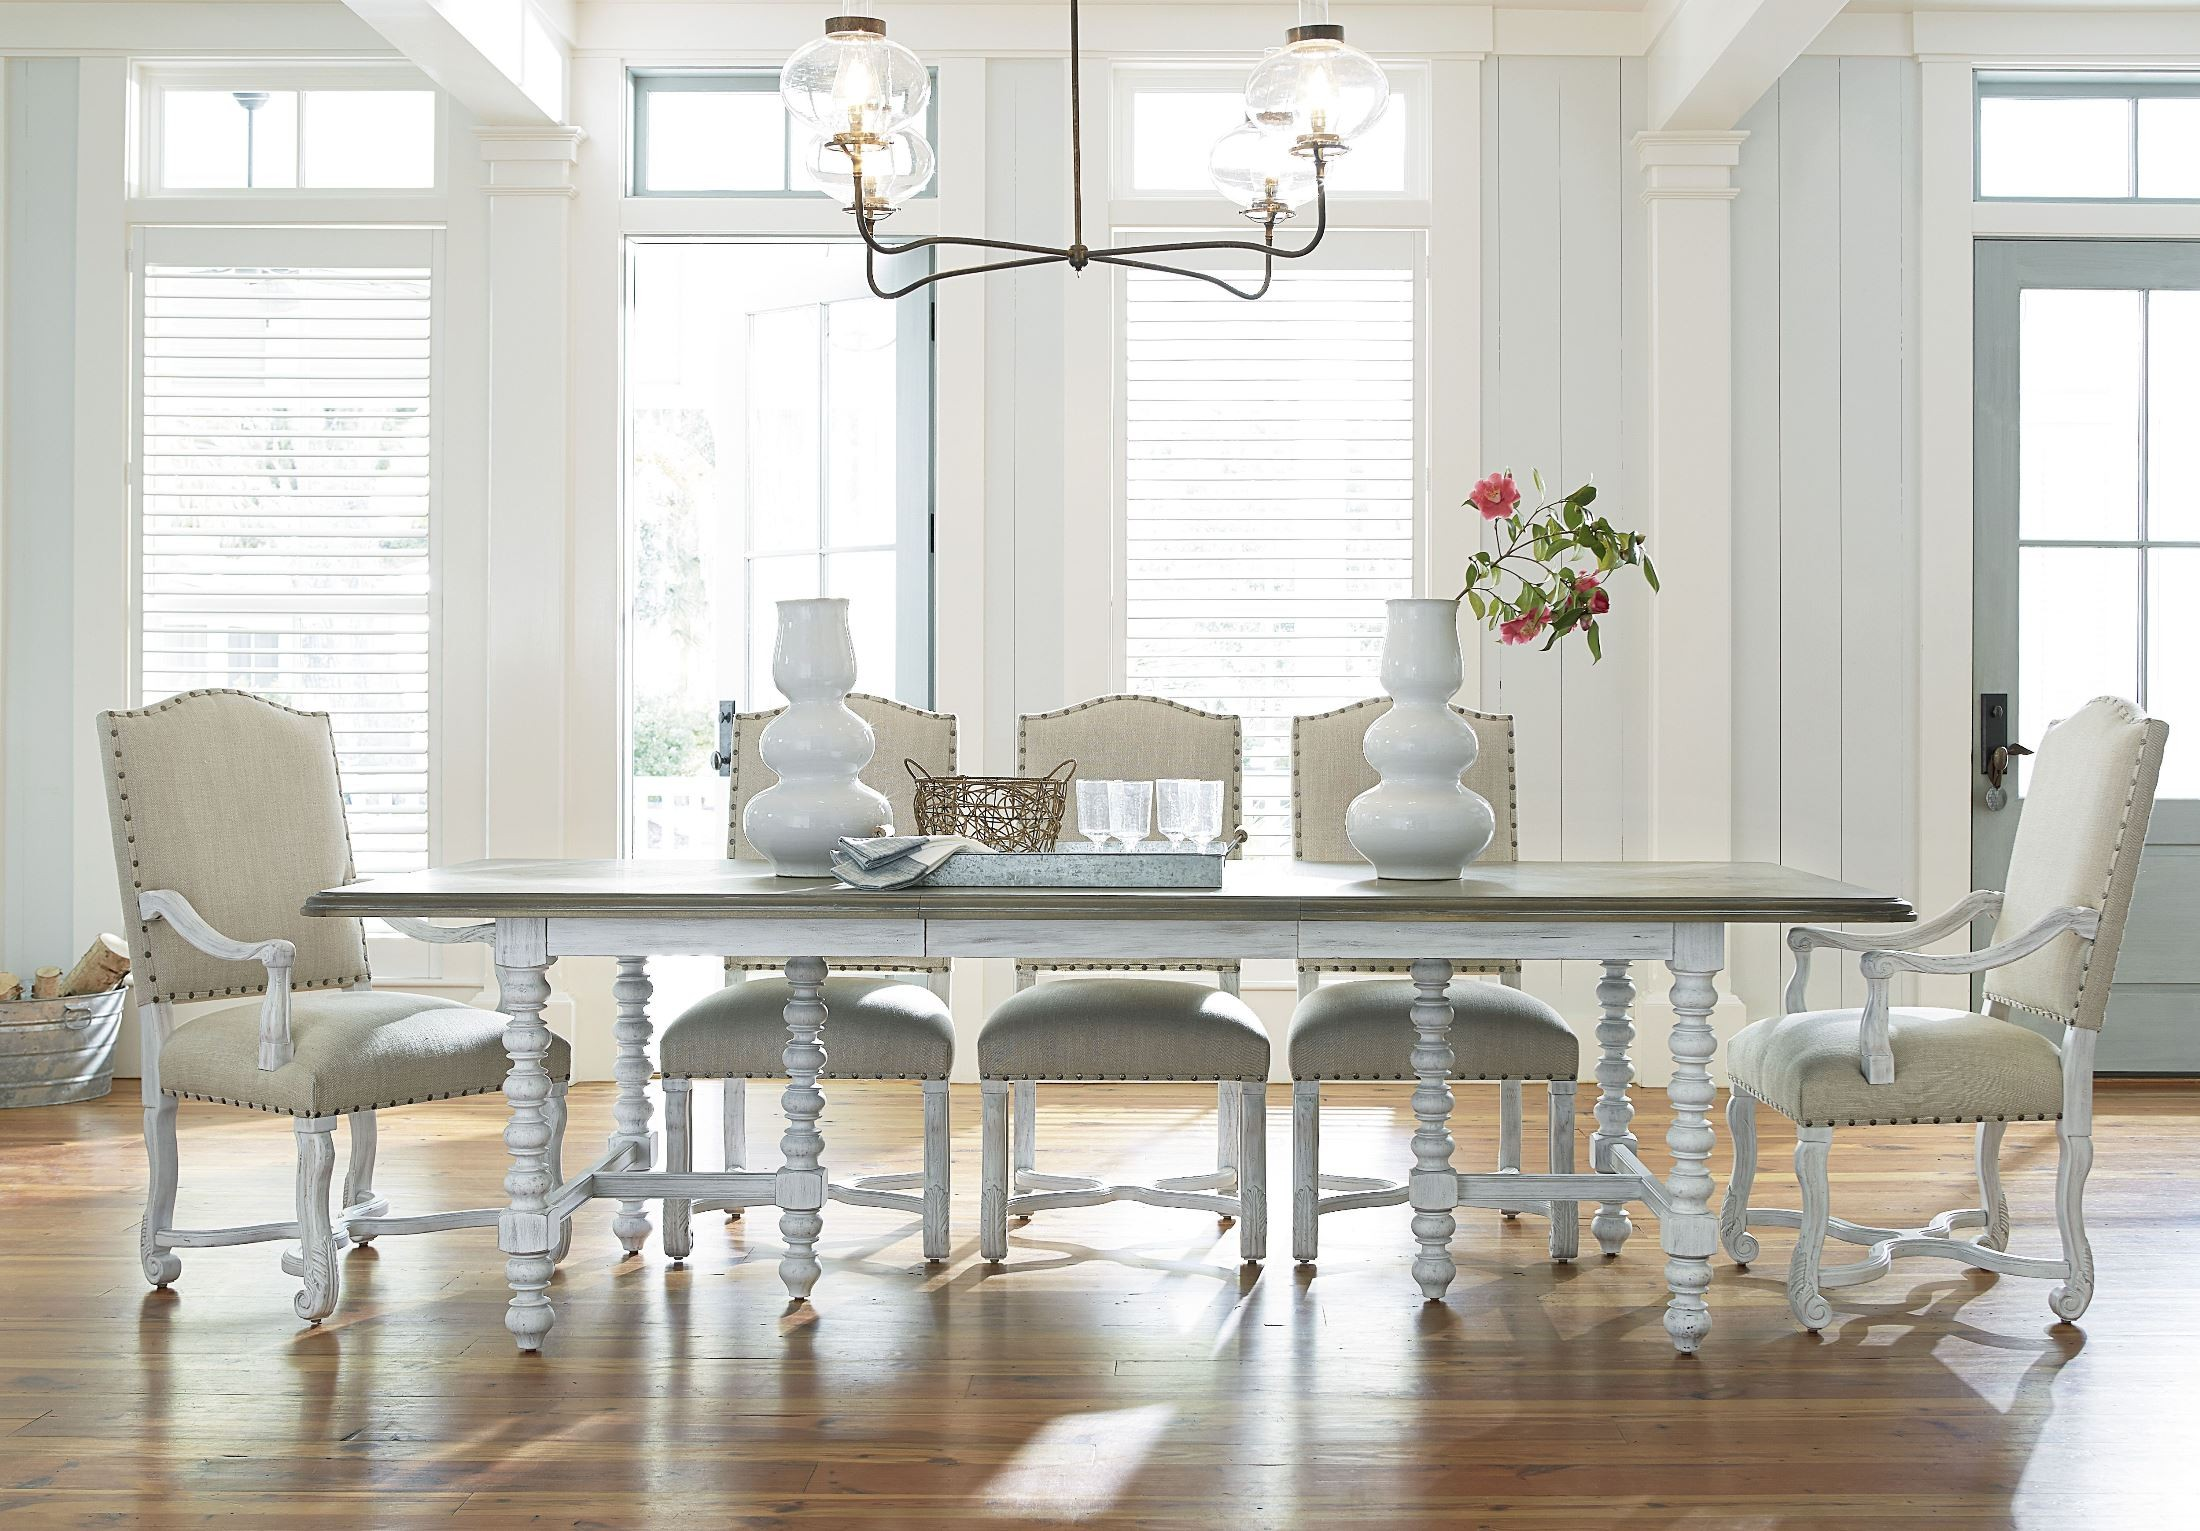 Dogwood Blossom Dining Room Set from Paula Deen (597A655)   Coleman ...